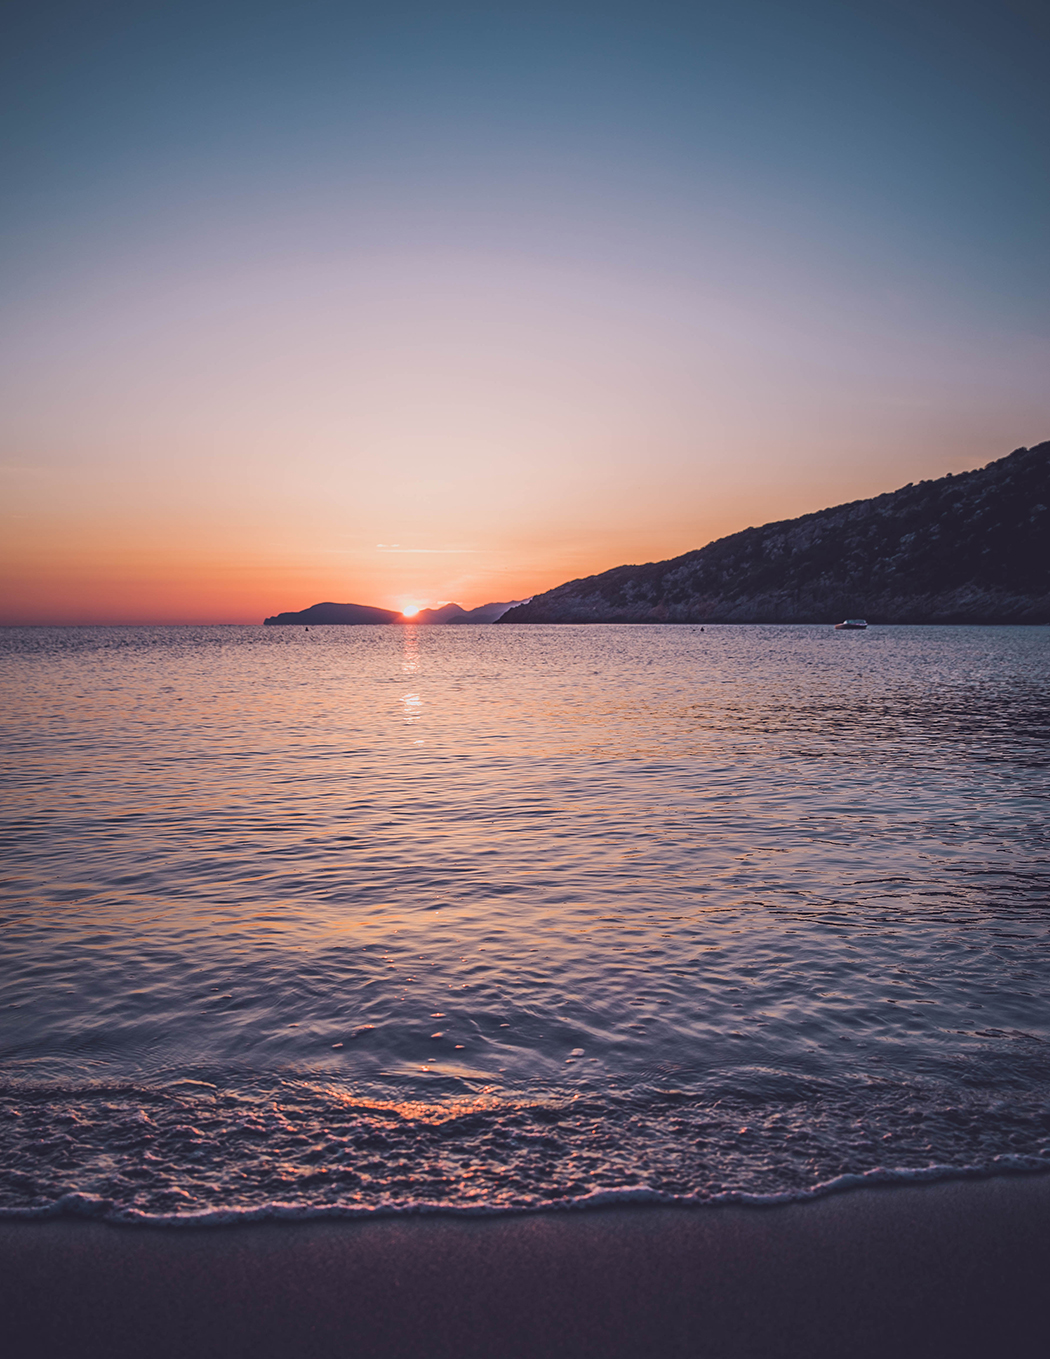 Travelblog-Travelblogger-Travel-Blog-Blogger-Muenchen-Deutschland-Kreta-Land_Rover-Experience-Kreta-Daios_Cove-Hotel-Lindarella-11-web